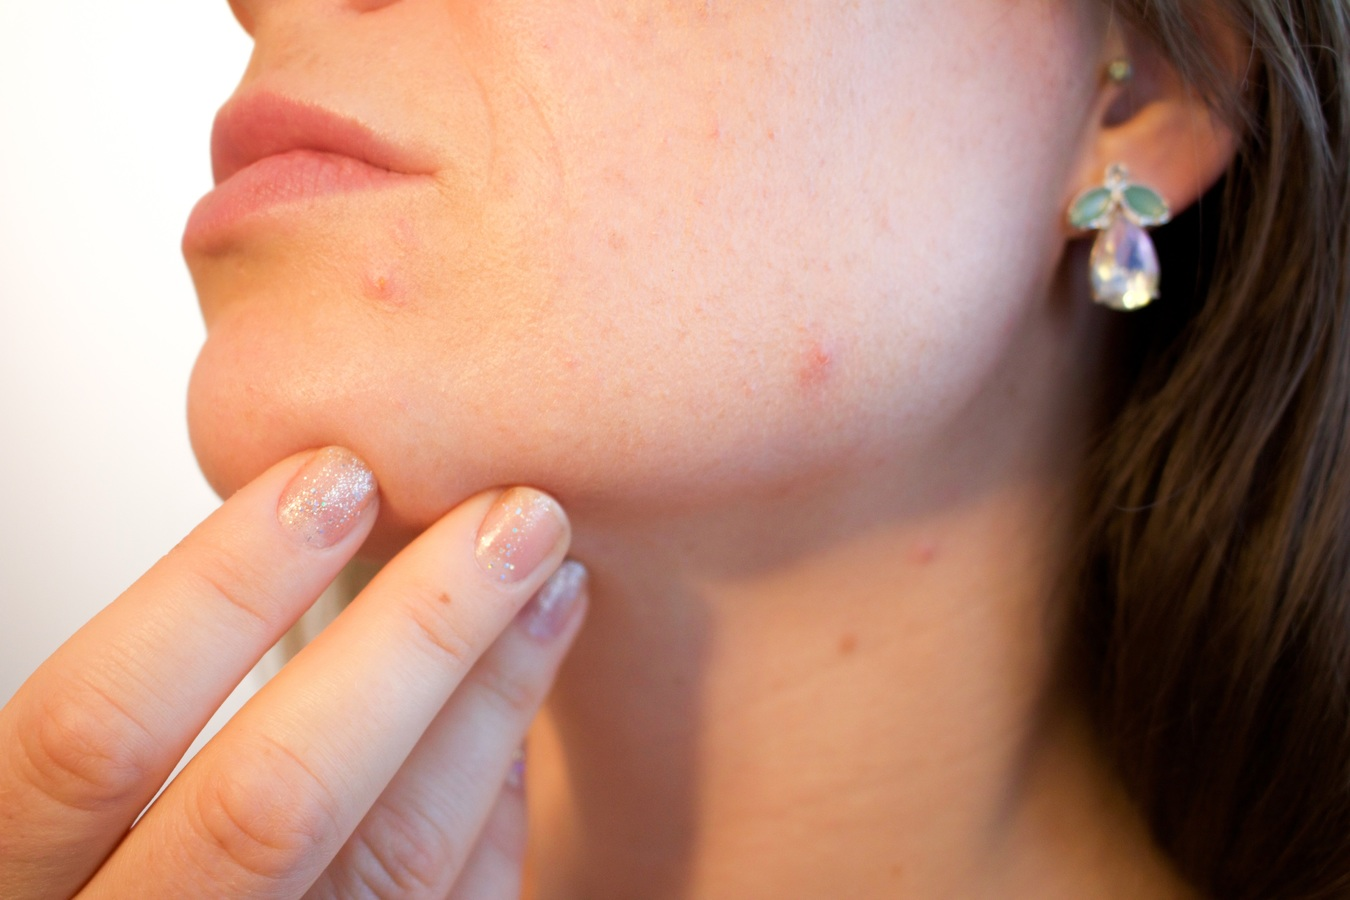 dermatite seborrhéique maladie de la peau